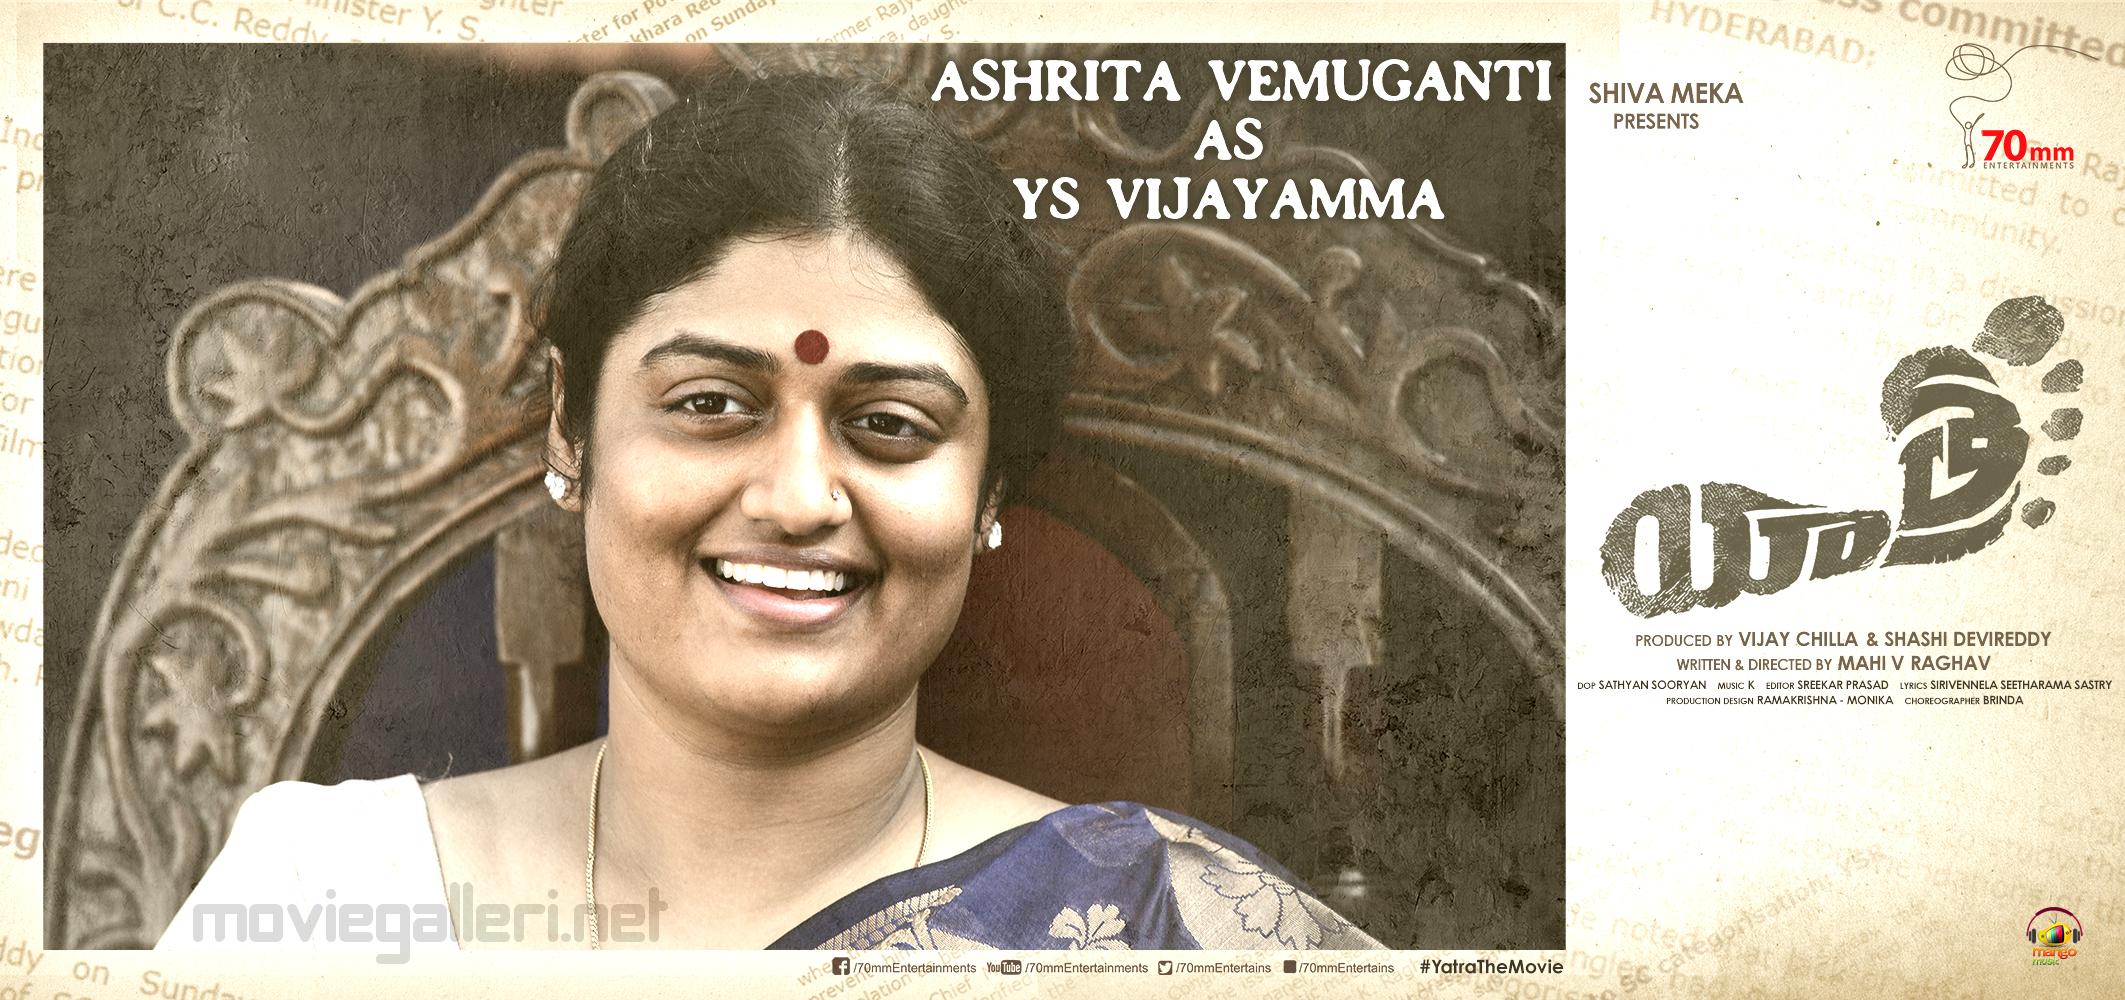 Actress Ashrita Vemuganti as YS Vijayamma in YSR Biopic Yatra Movie Wallpaper HD